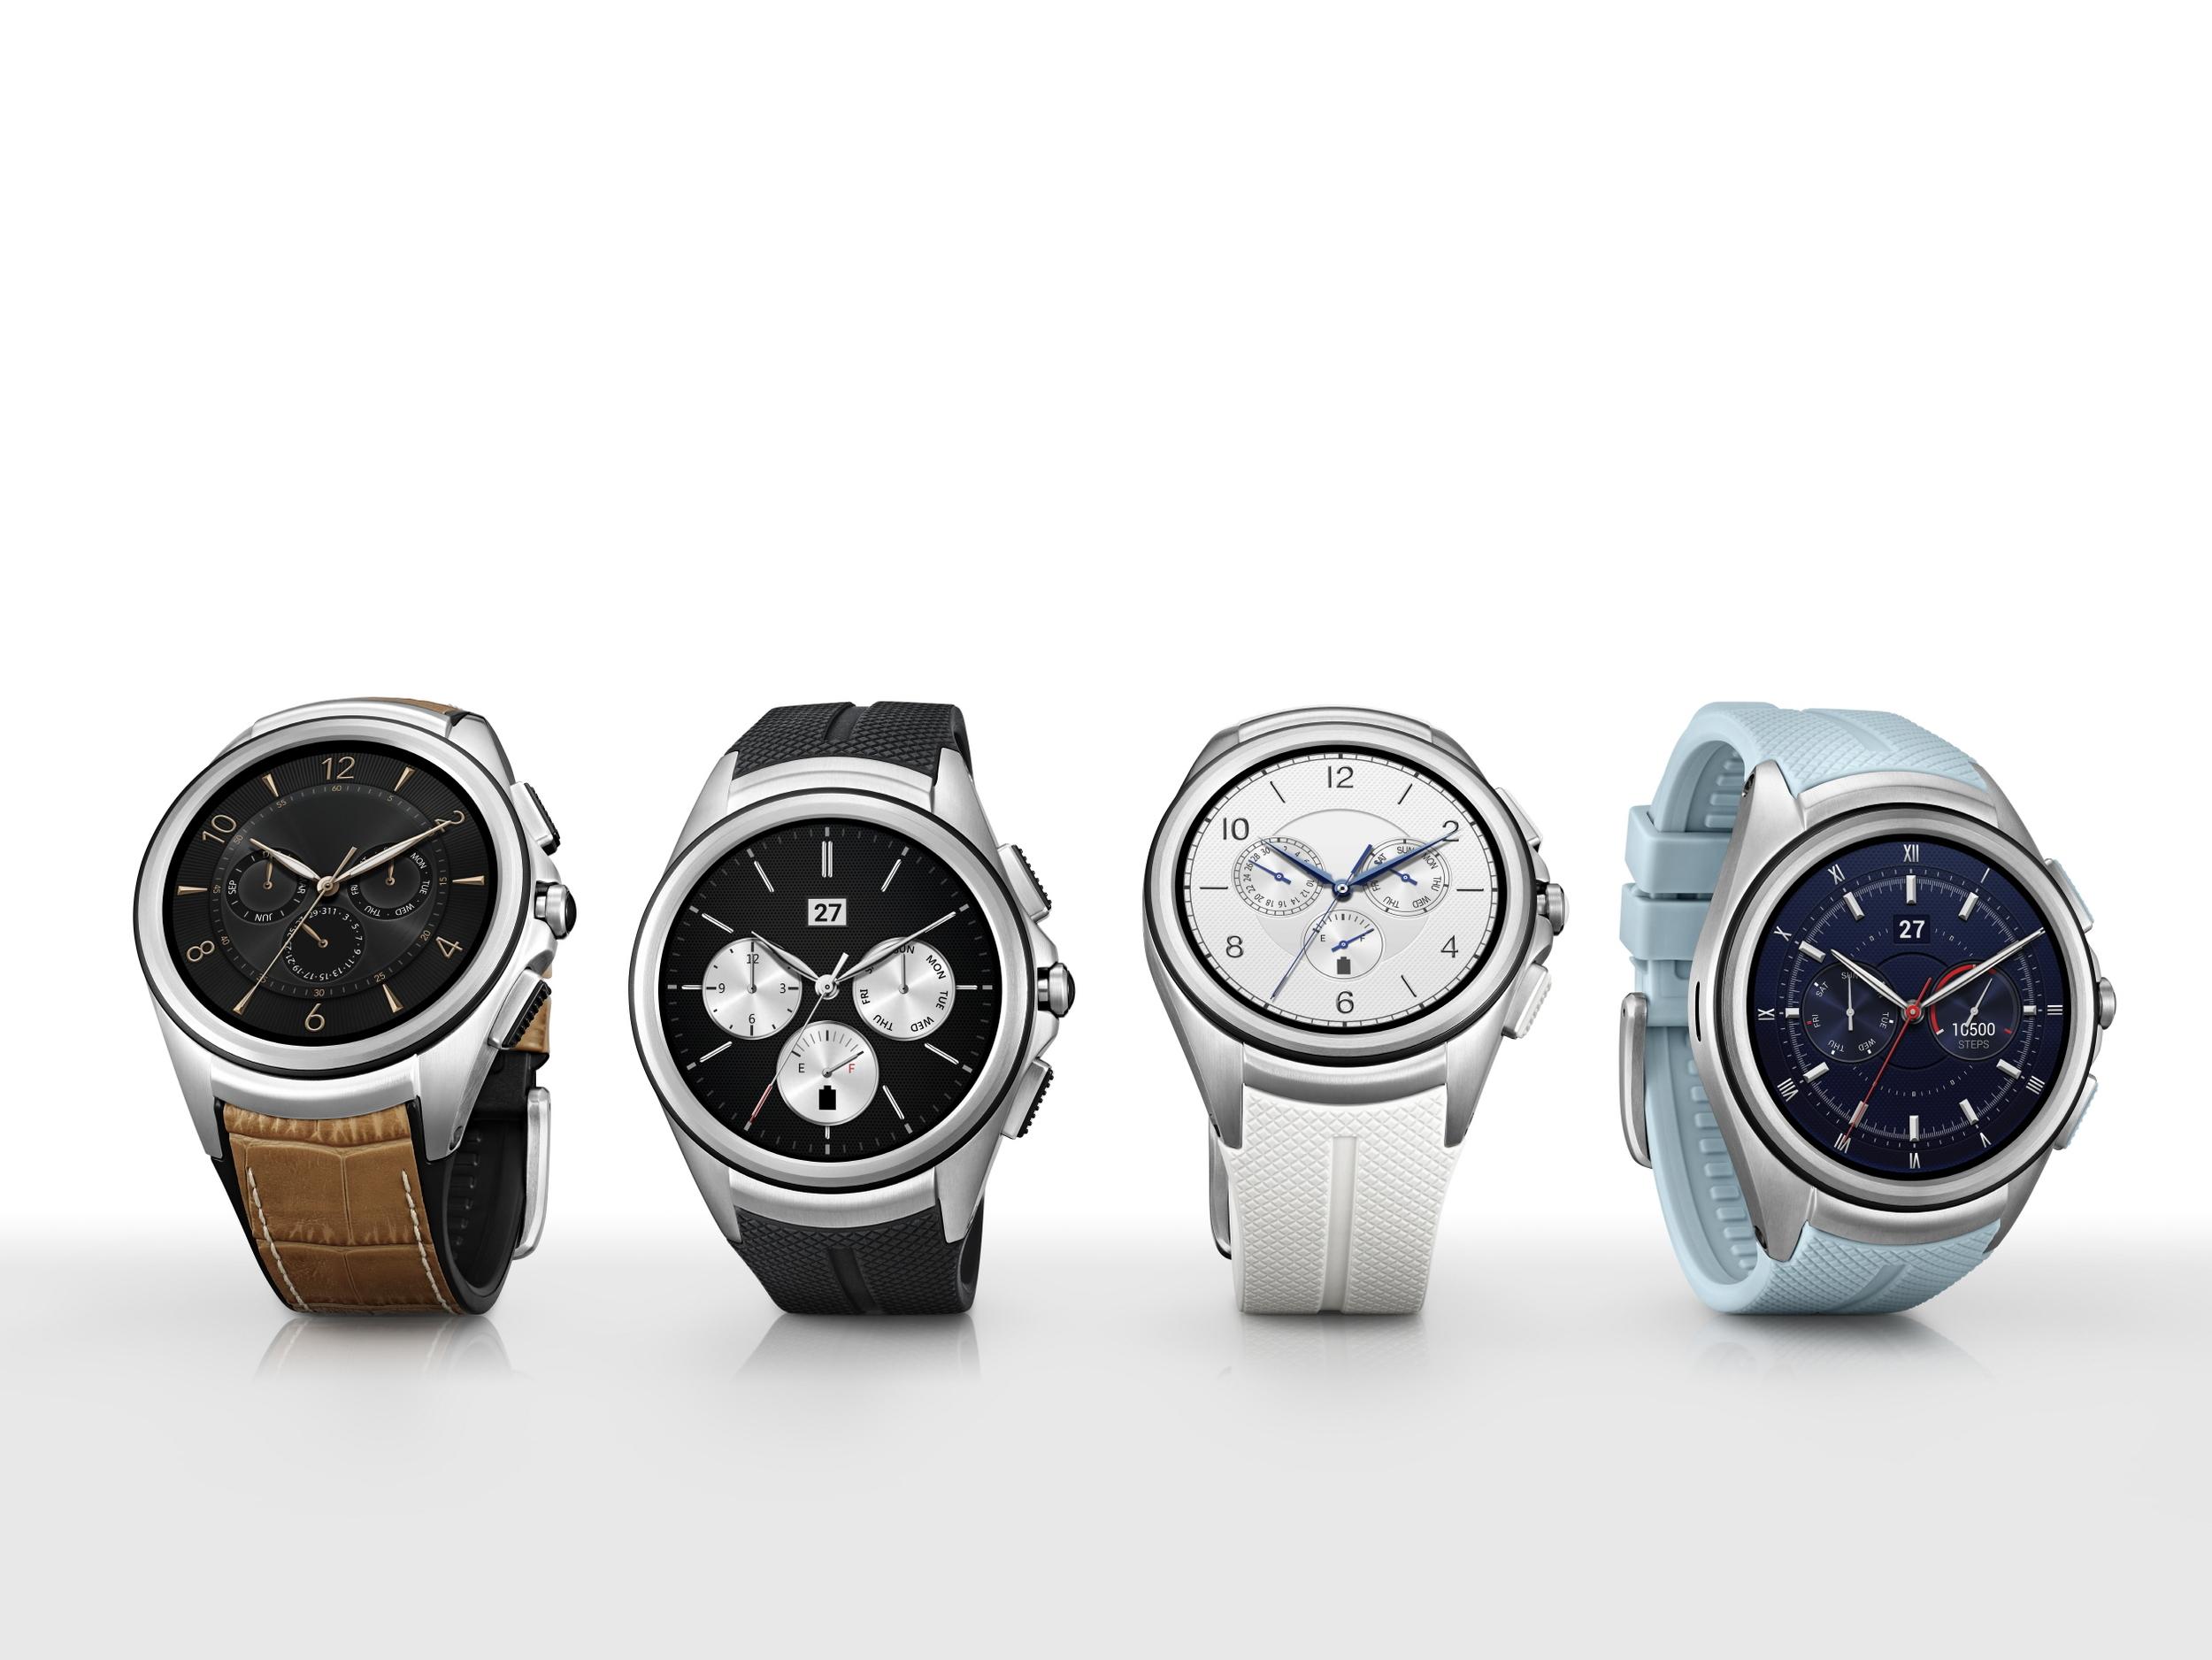 LG Watch Urbane 2nd Edition : LG'den ilk LTE Destekli Android Akıllı Saat!